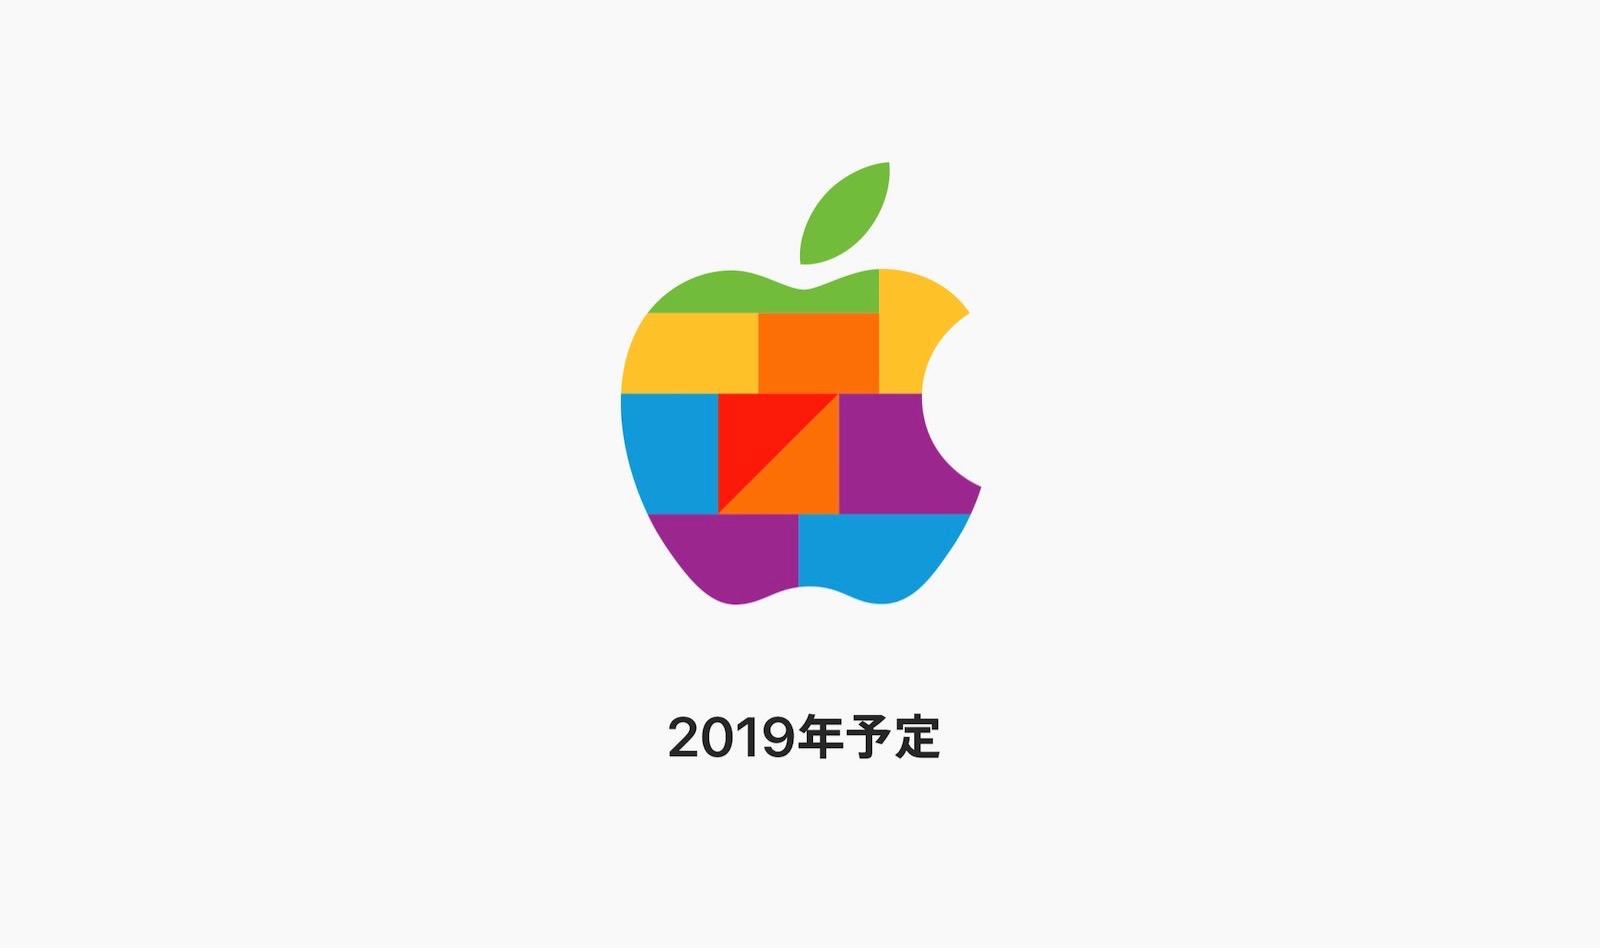 New Apple Store Very Likely Apple Kawasaki